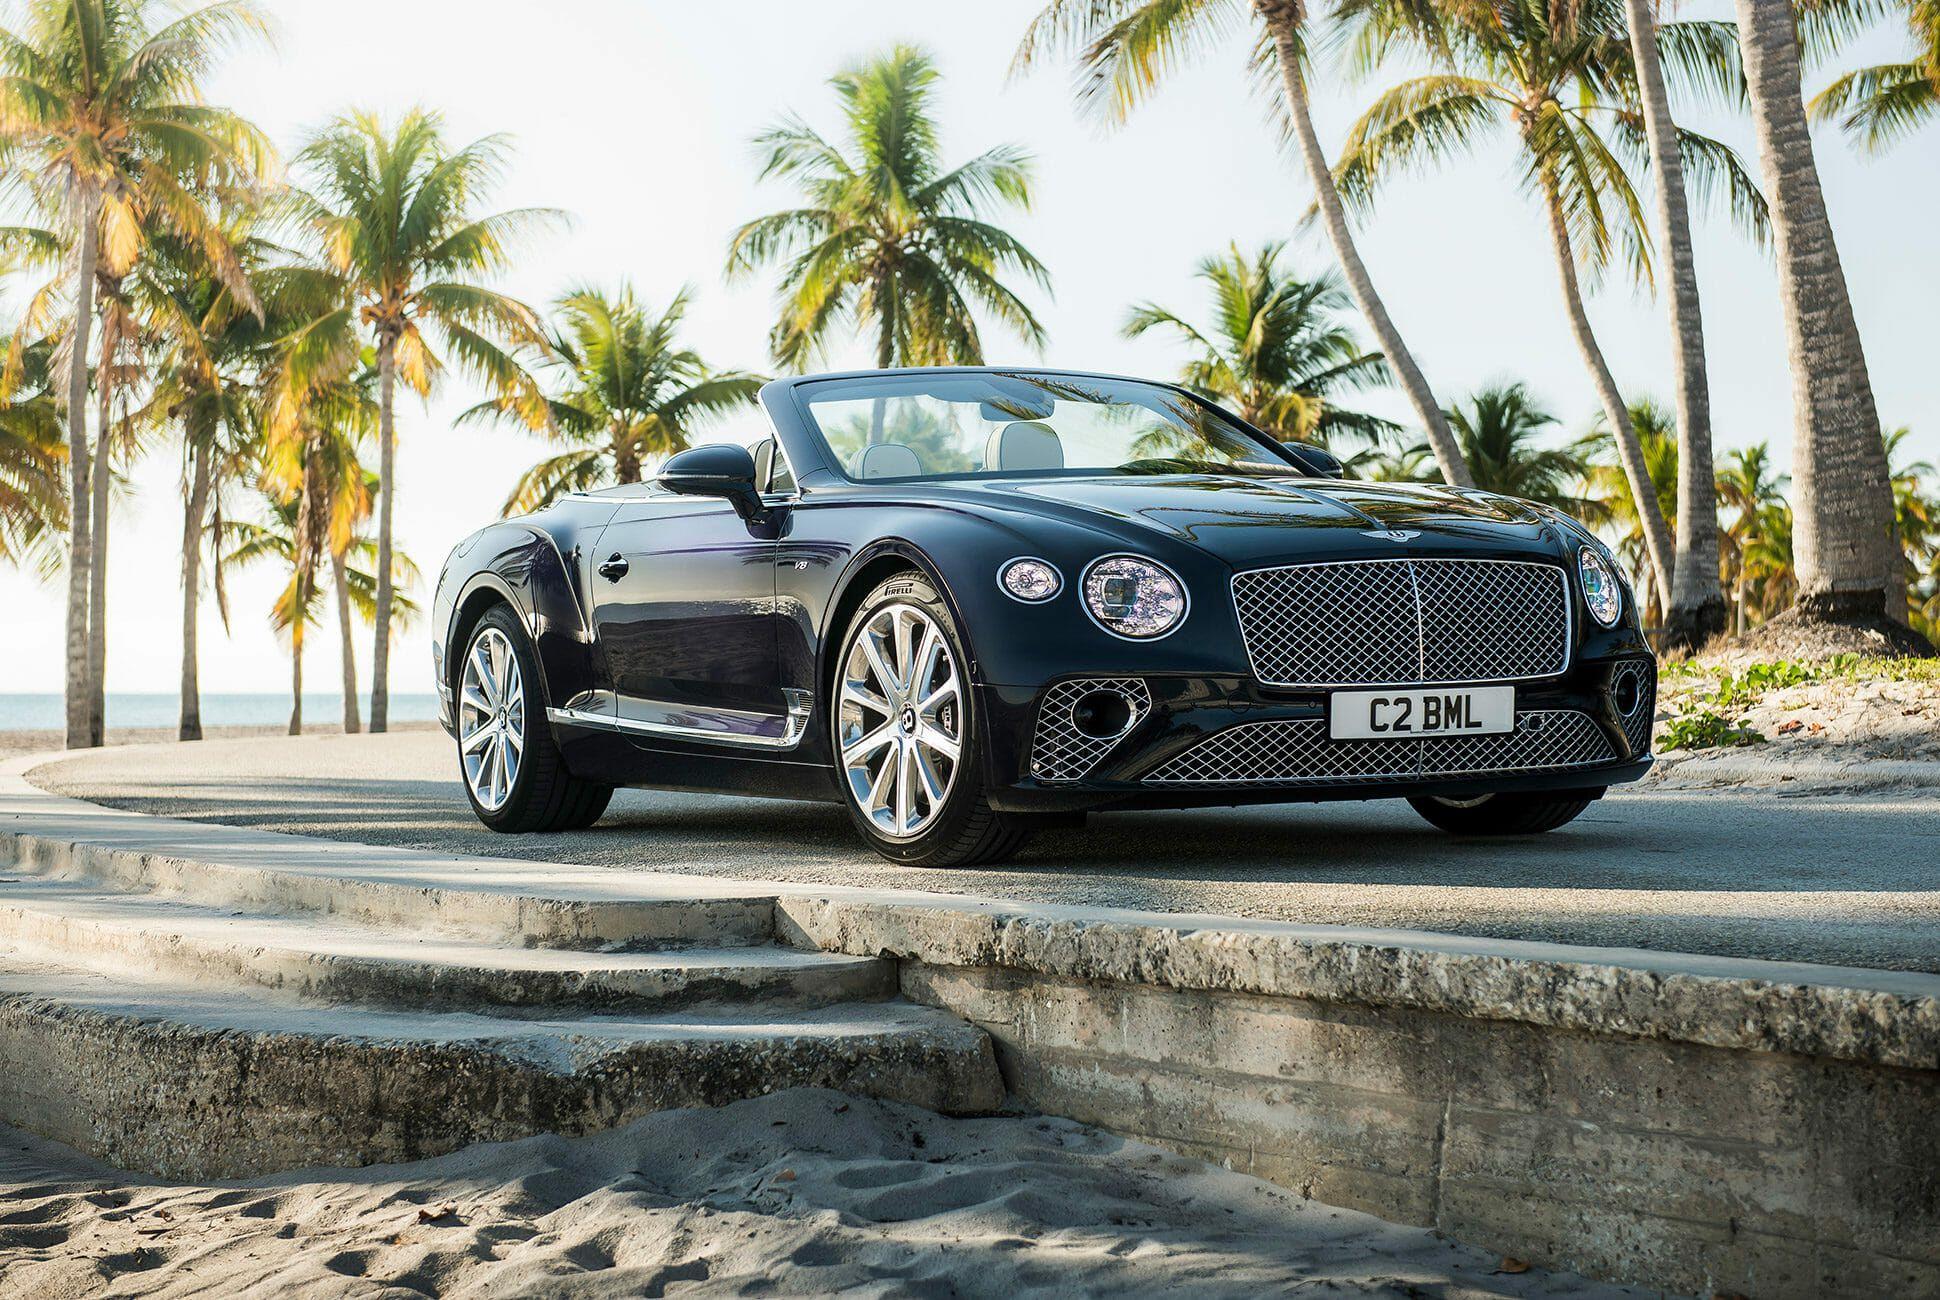 Bentley-Continental-GT-Convertible-V8-gear-patrol-slide-07